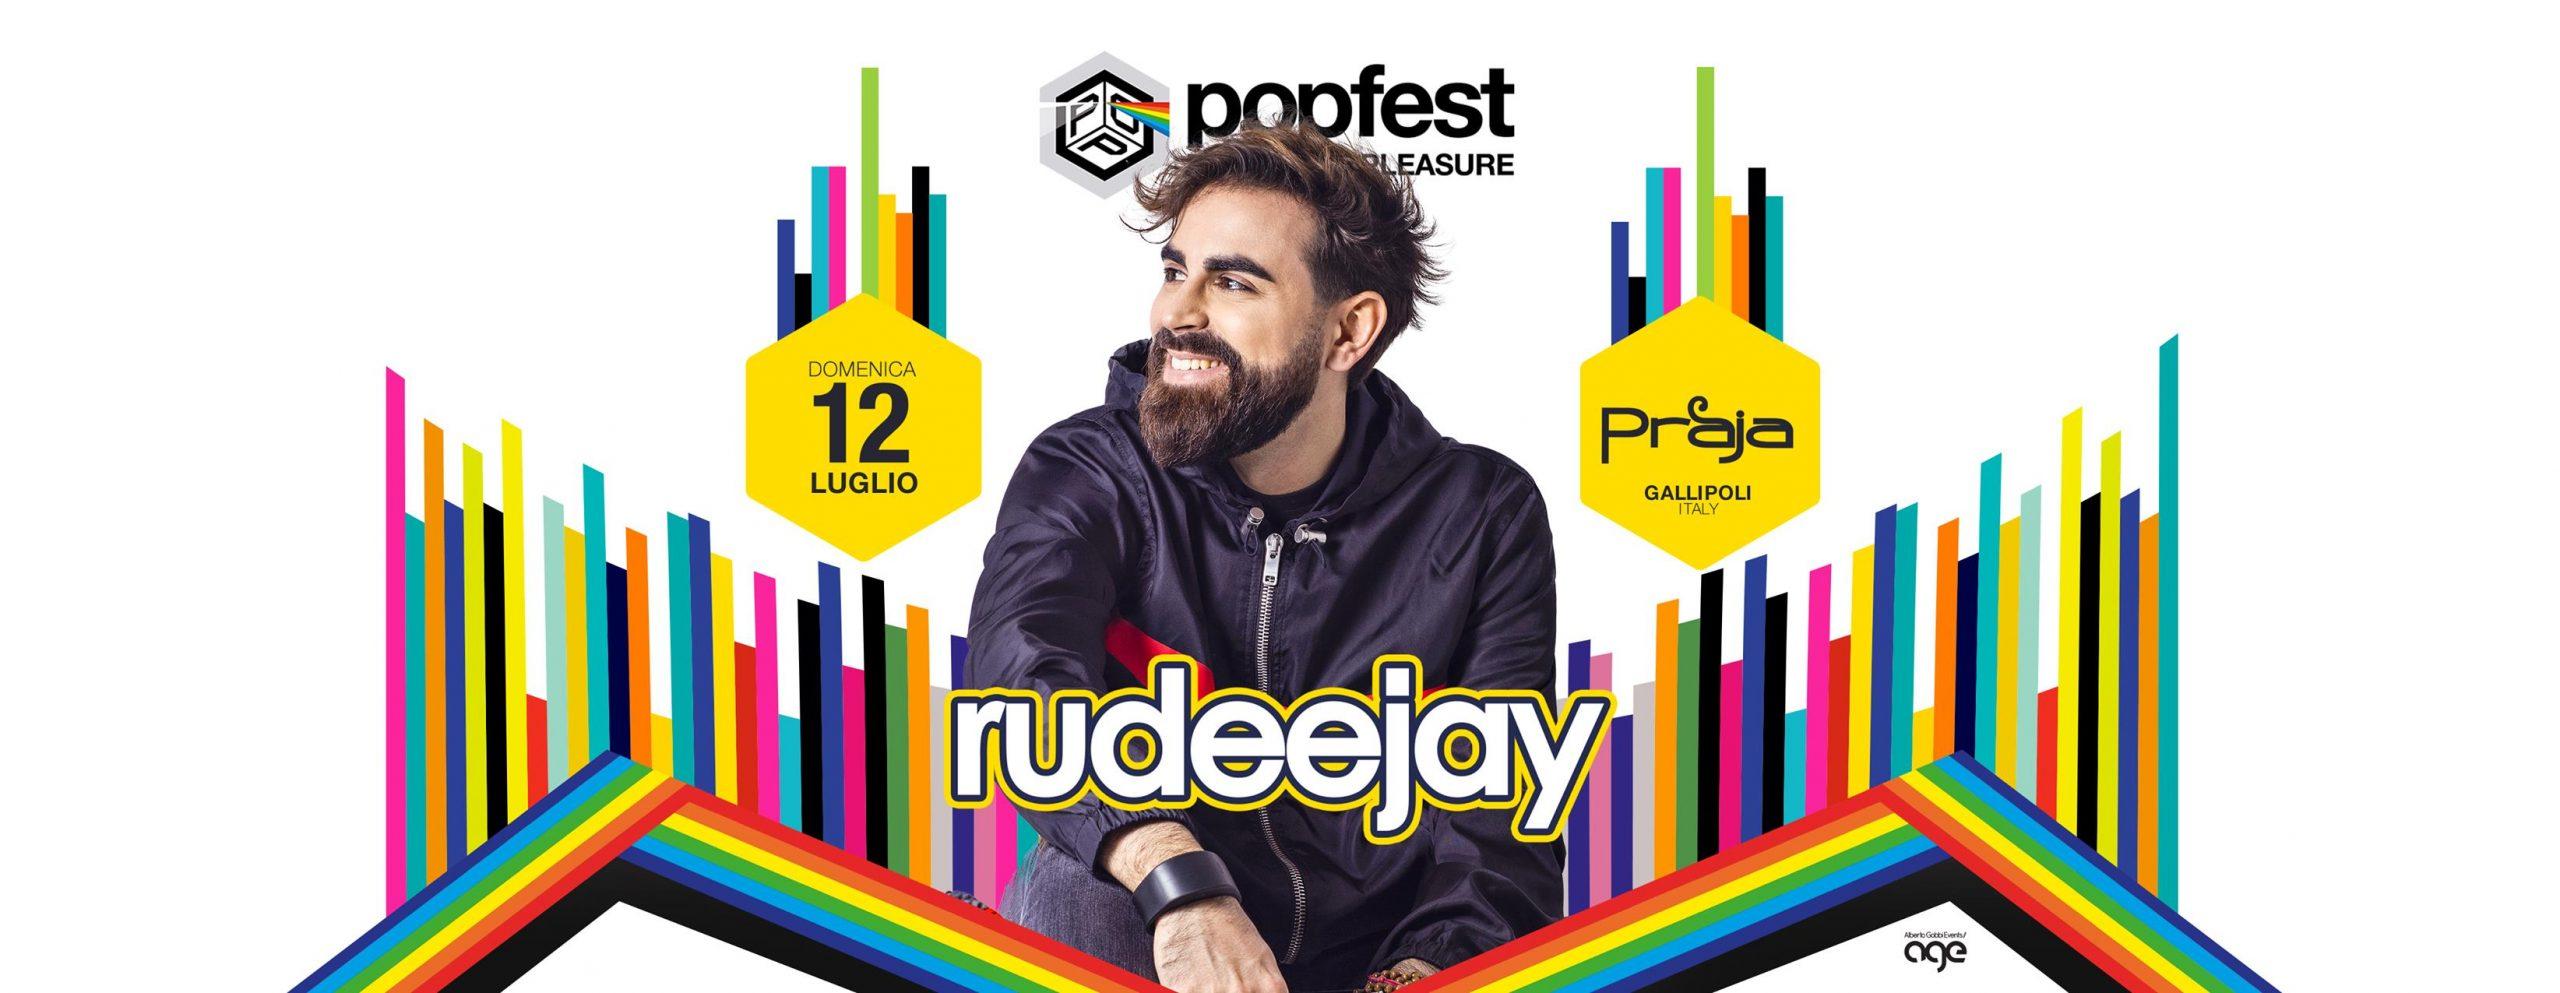 rudeejay-praja-hgallipoli-domenica-12-luglio-scaled.jpg